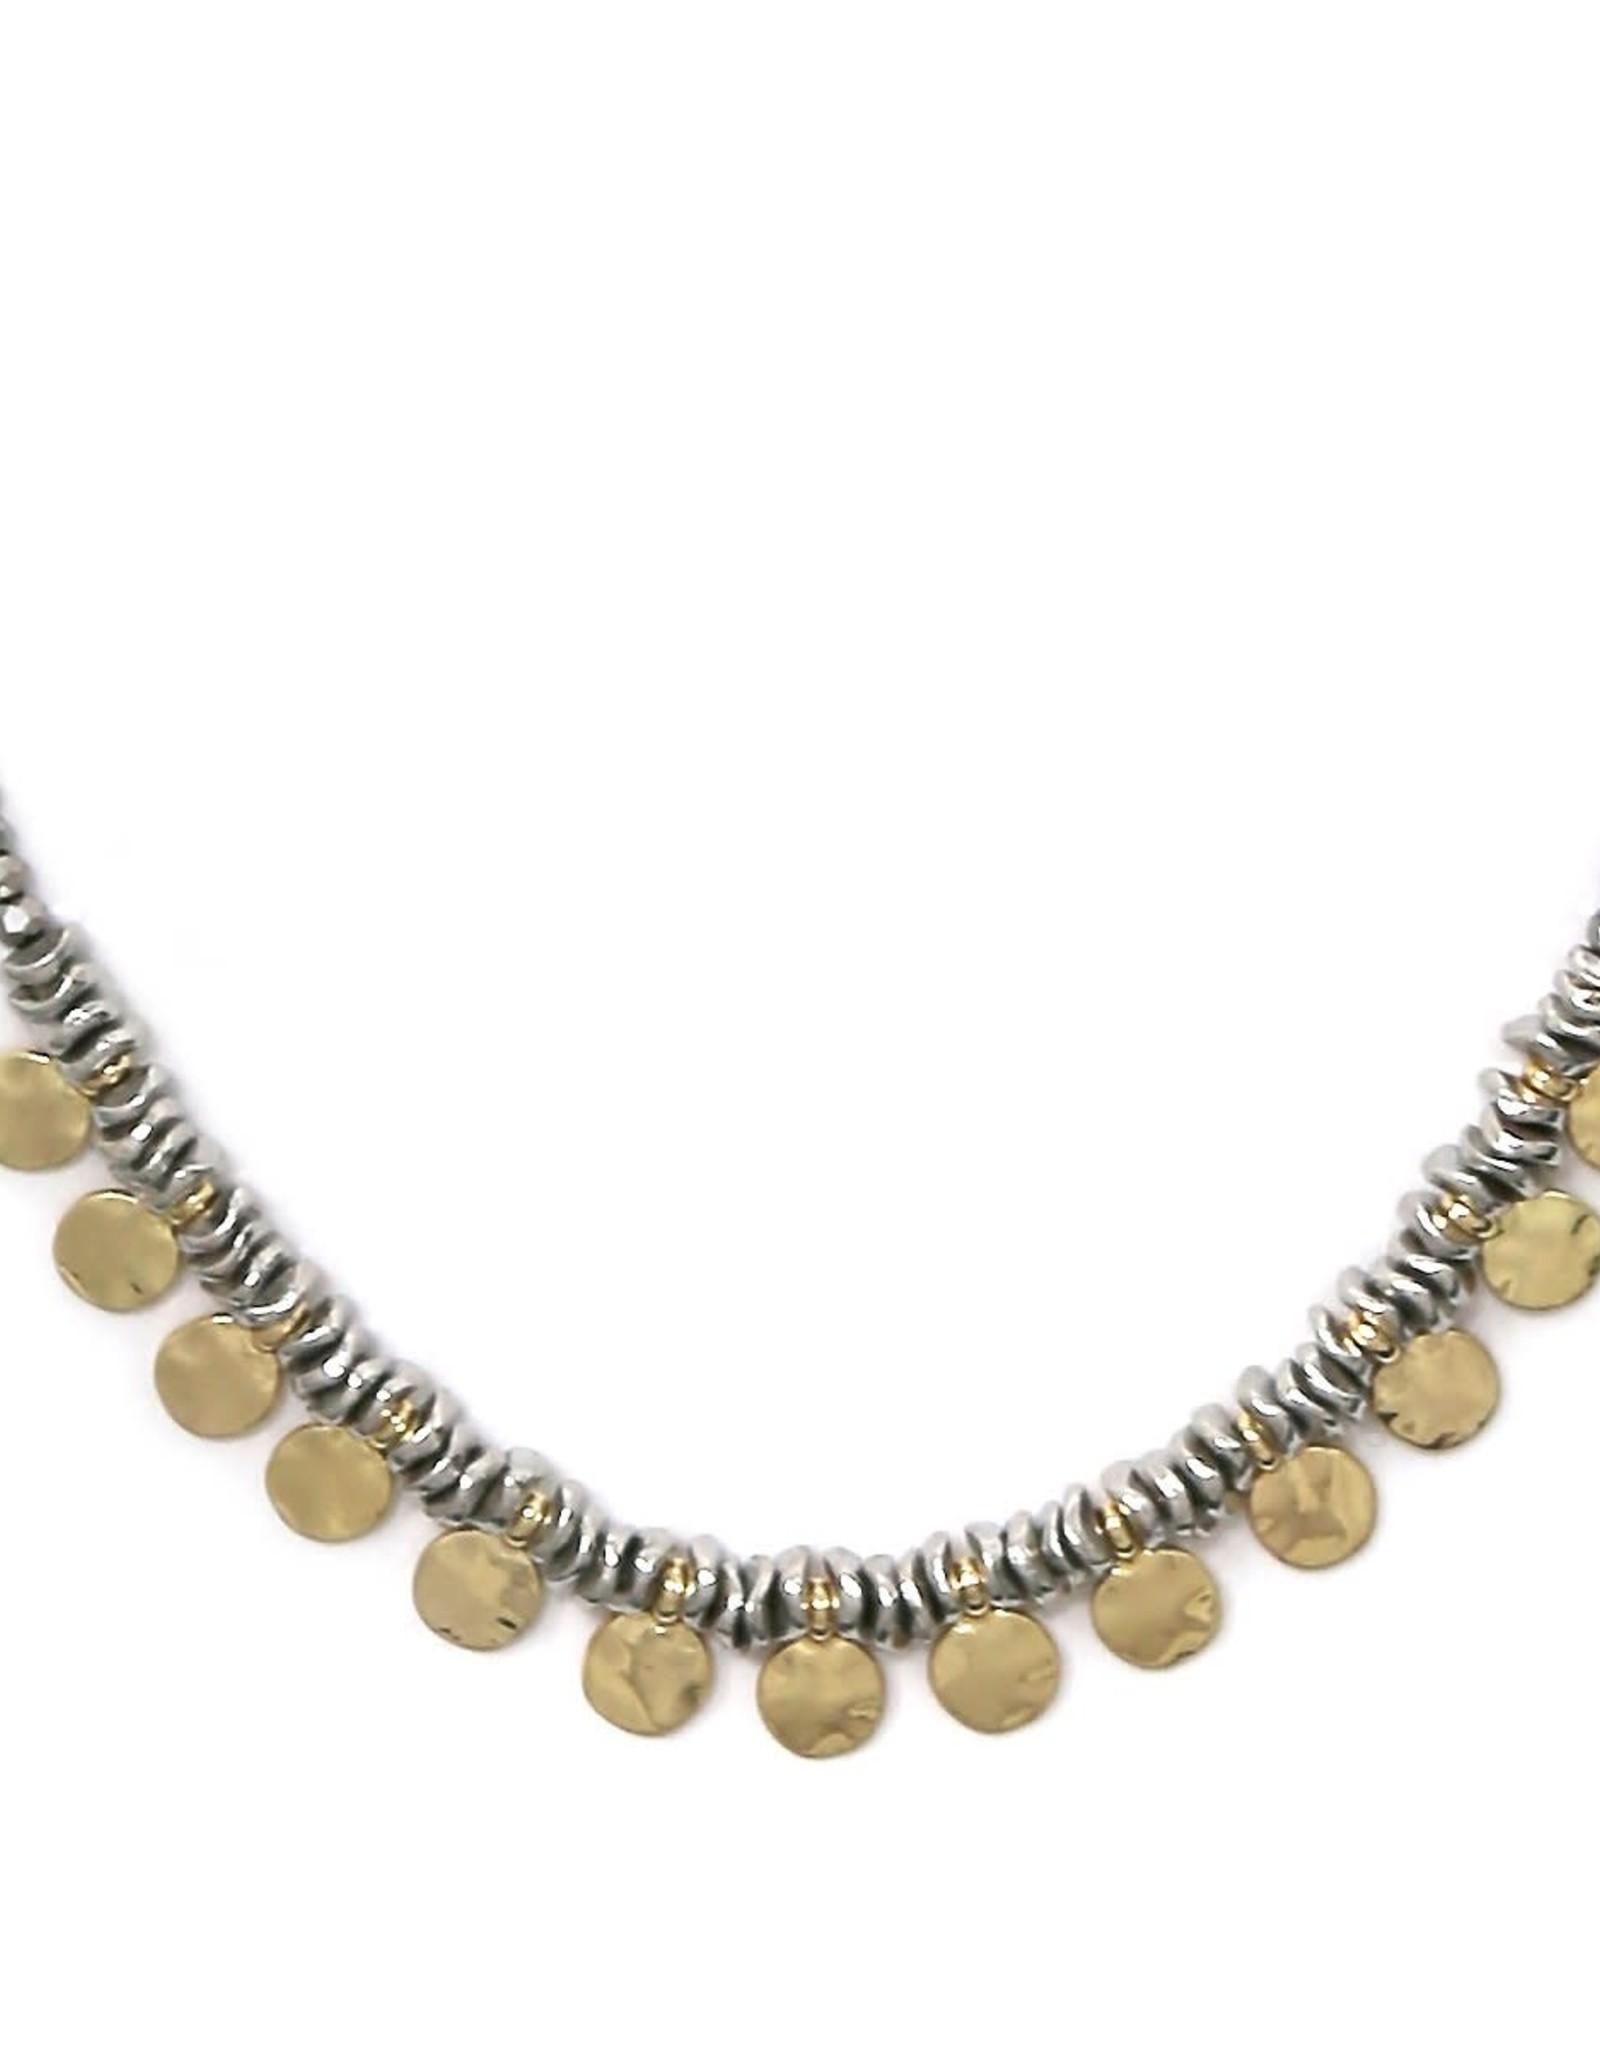 Blue Suede Jewels Hammer Textured Mini Disc Fringe Necklace